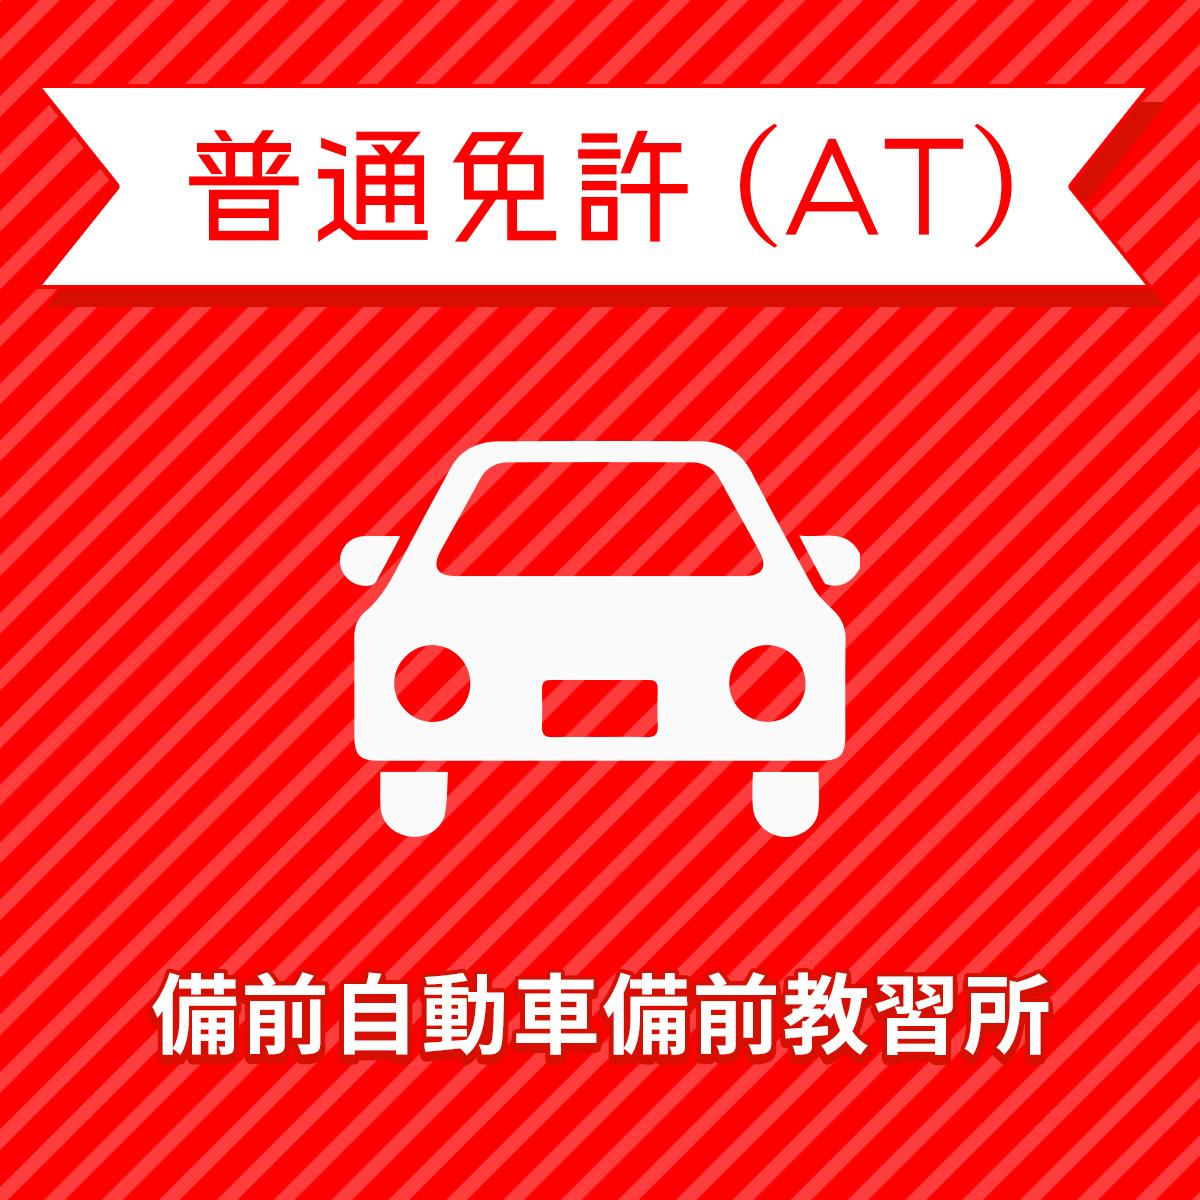 【岡山県備前市】普通車ATコース(一般料金)<免許なし/原付免許所持対象>